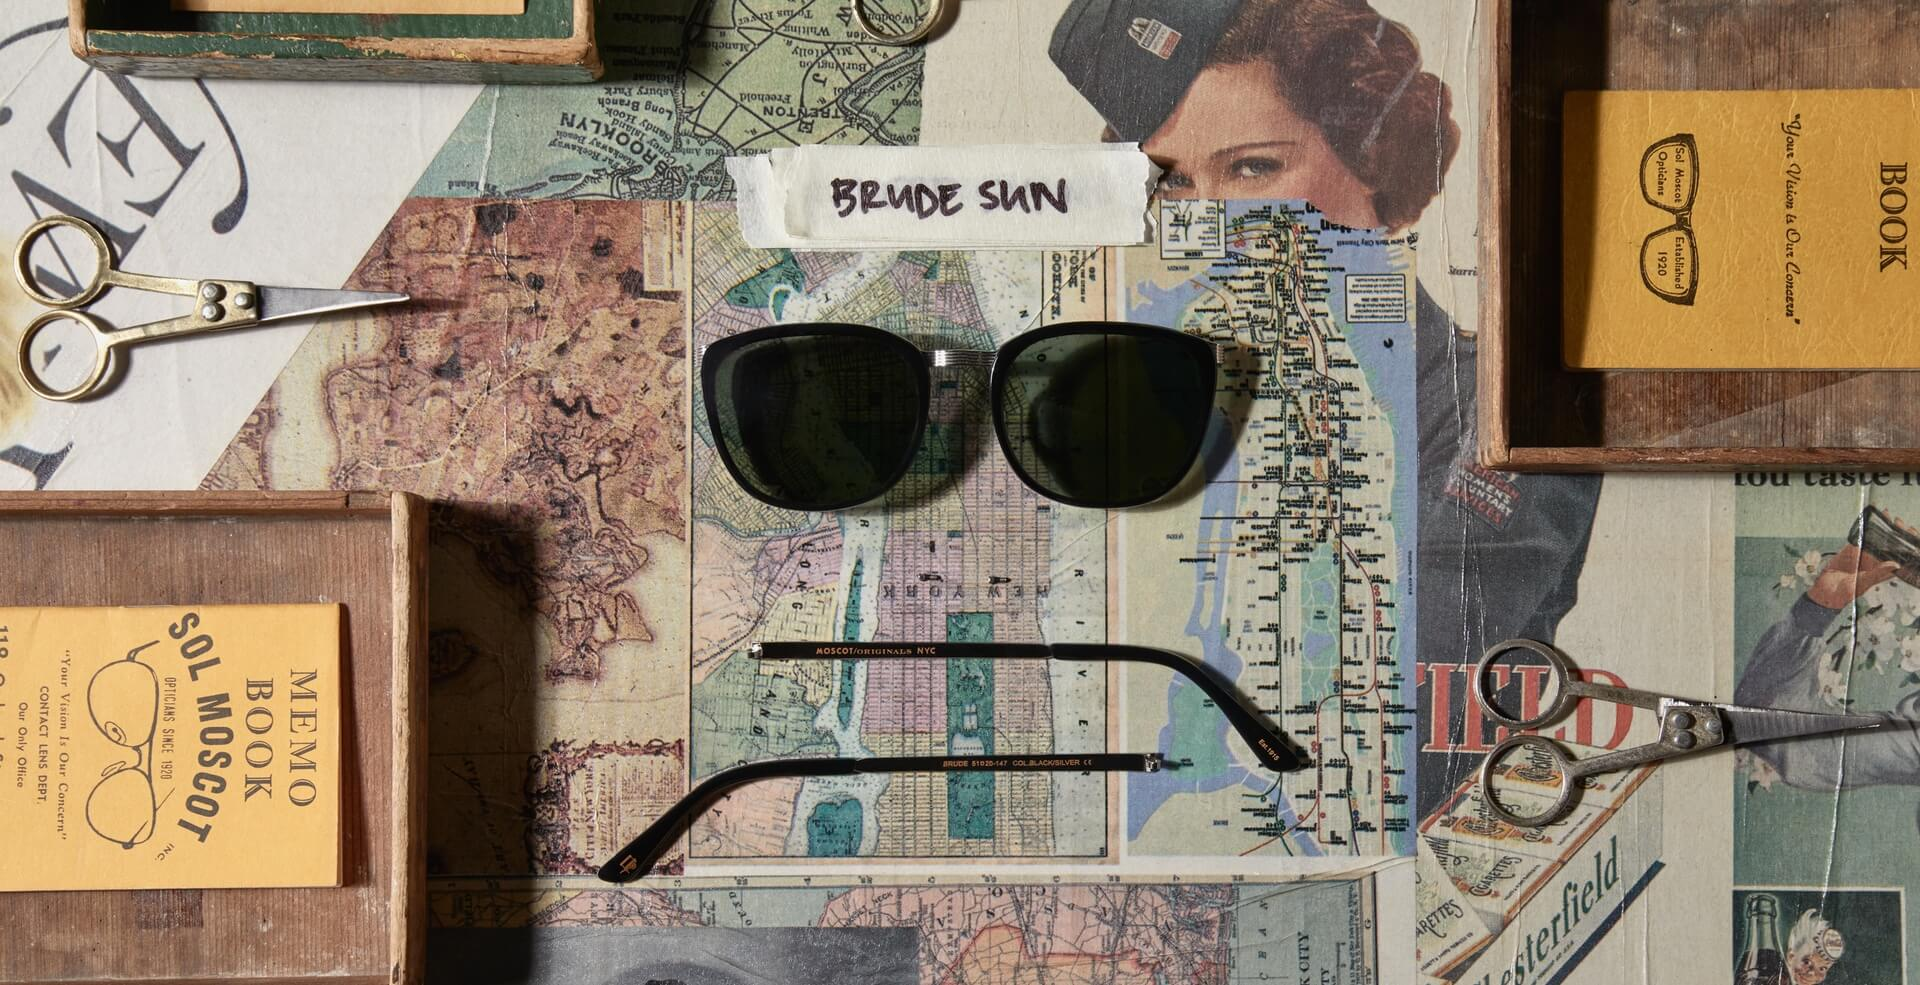 BRUDE SUN